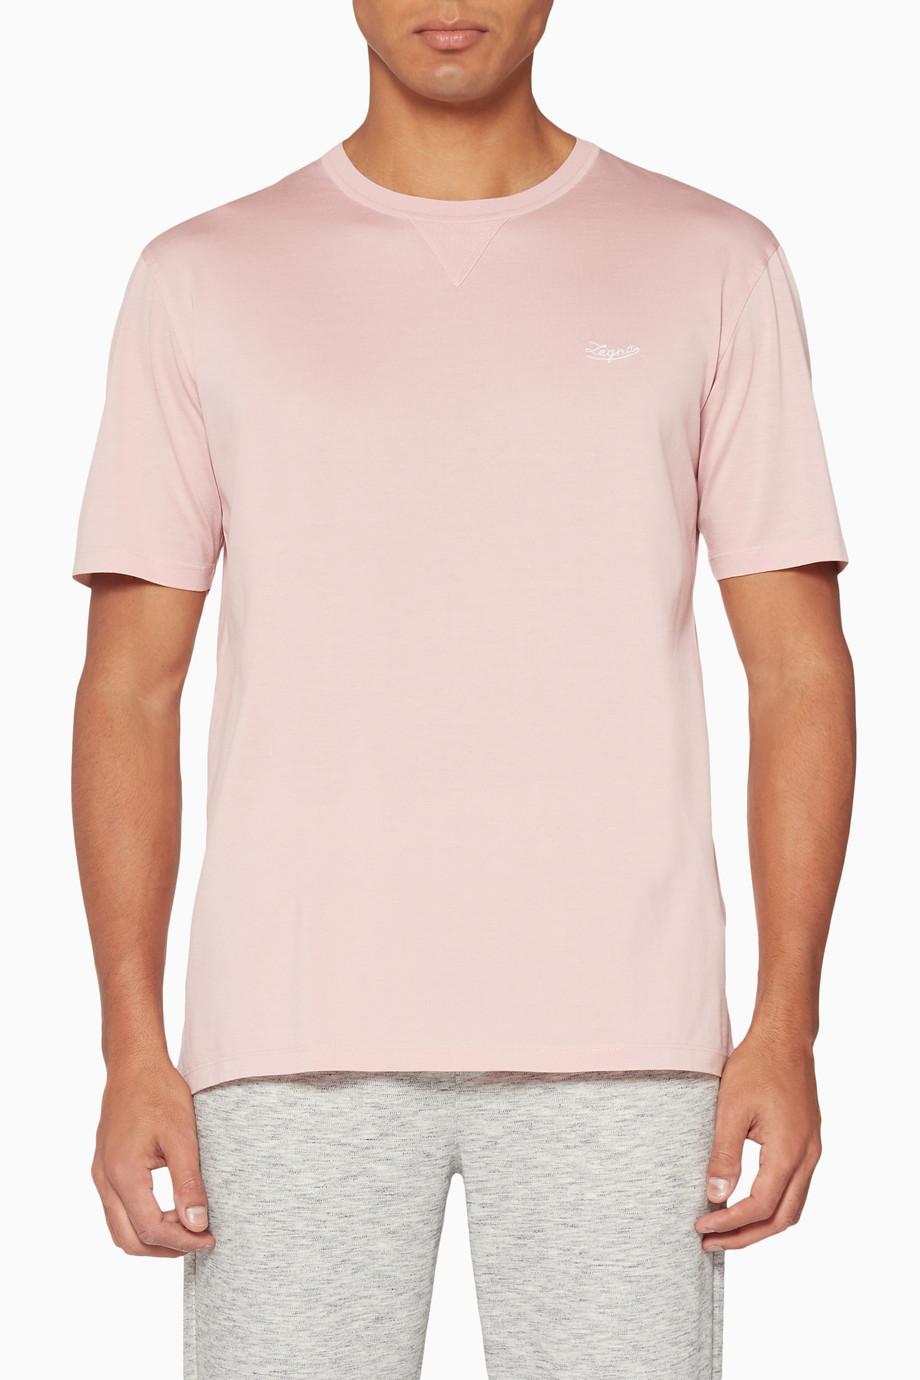 ba92e74c Shop Ermenegildo Zegna Pink Pale-Pink Mercerized Cotton T-Shirt for ...